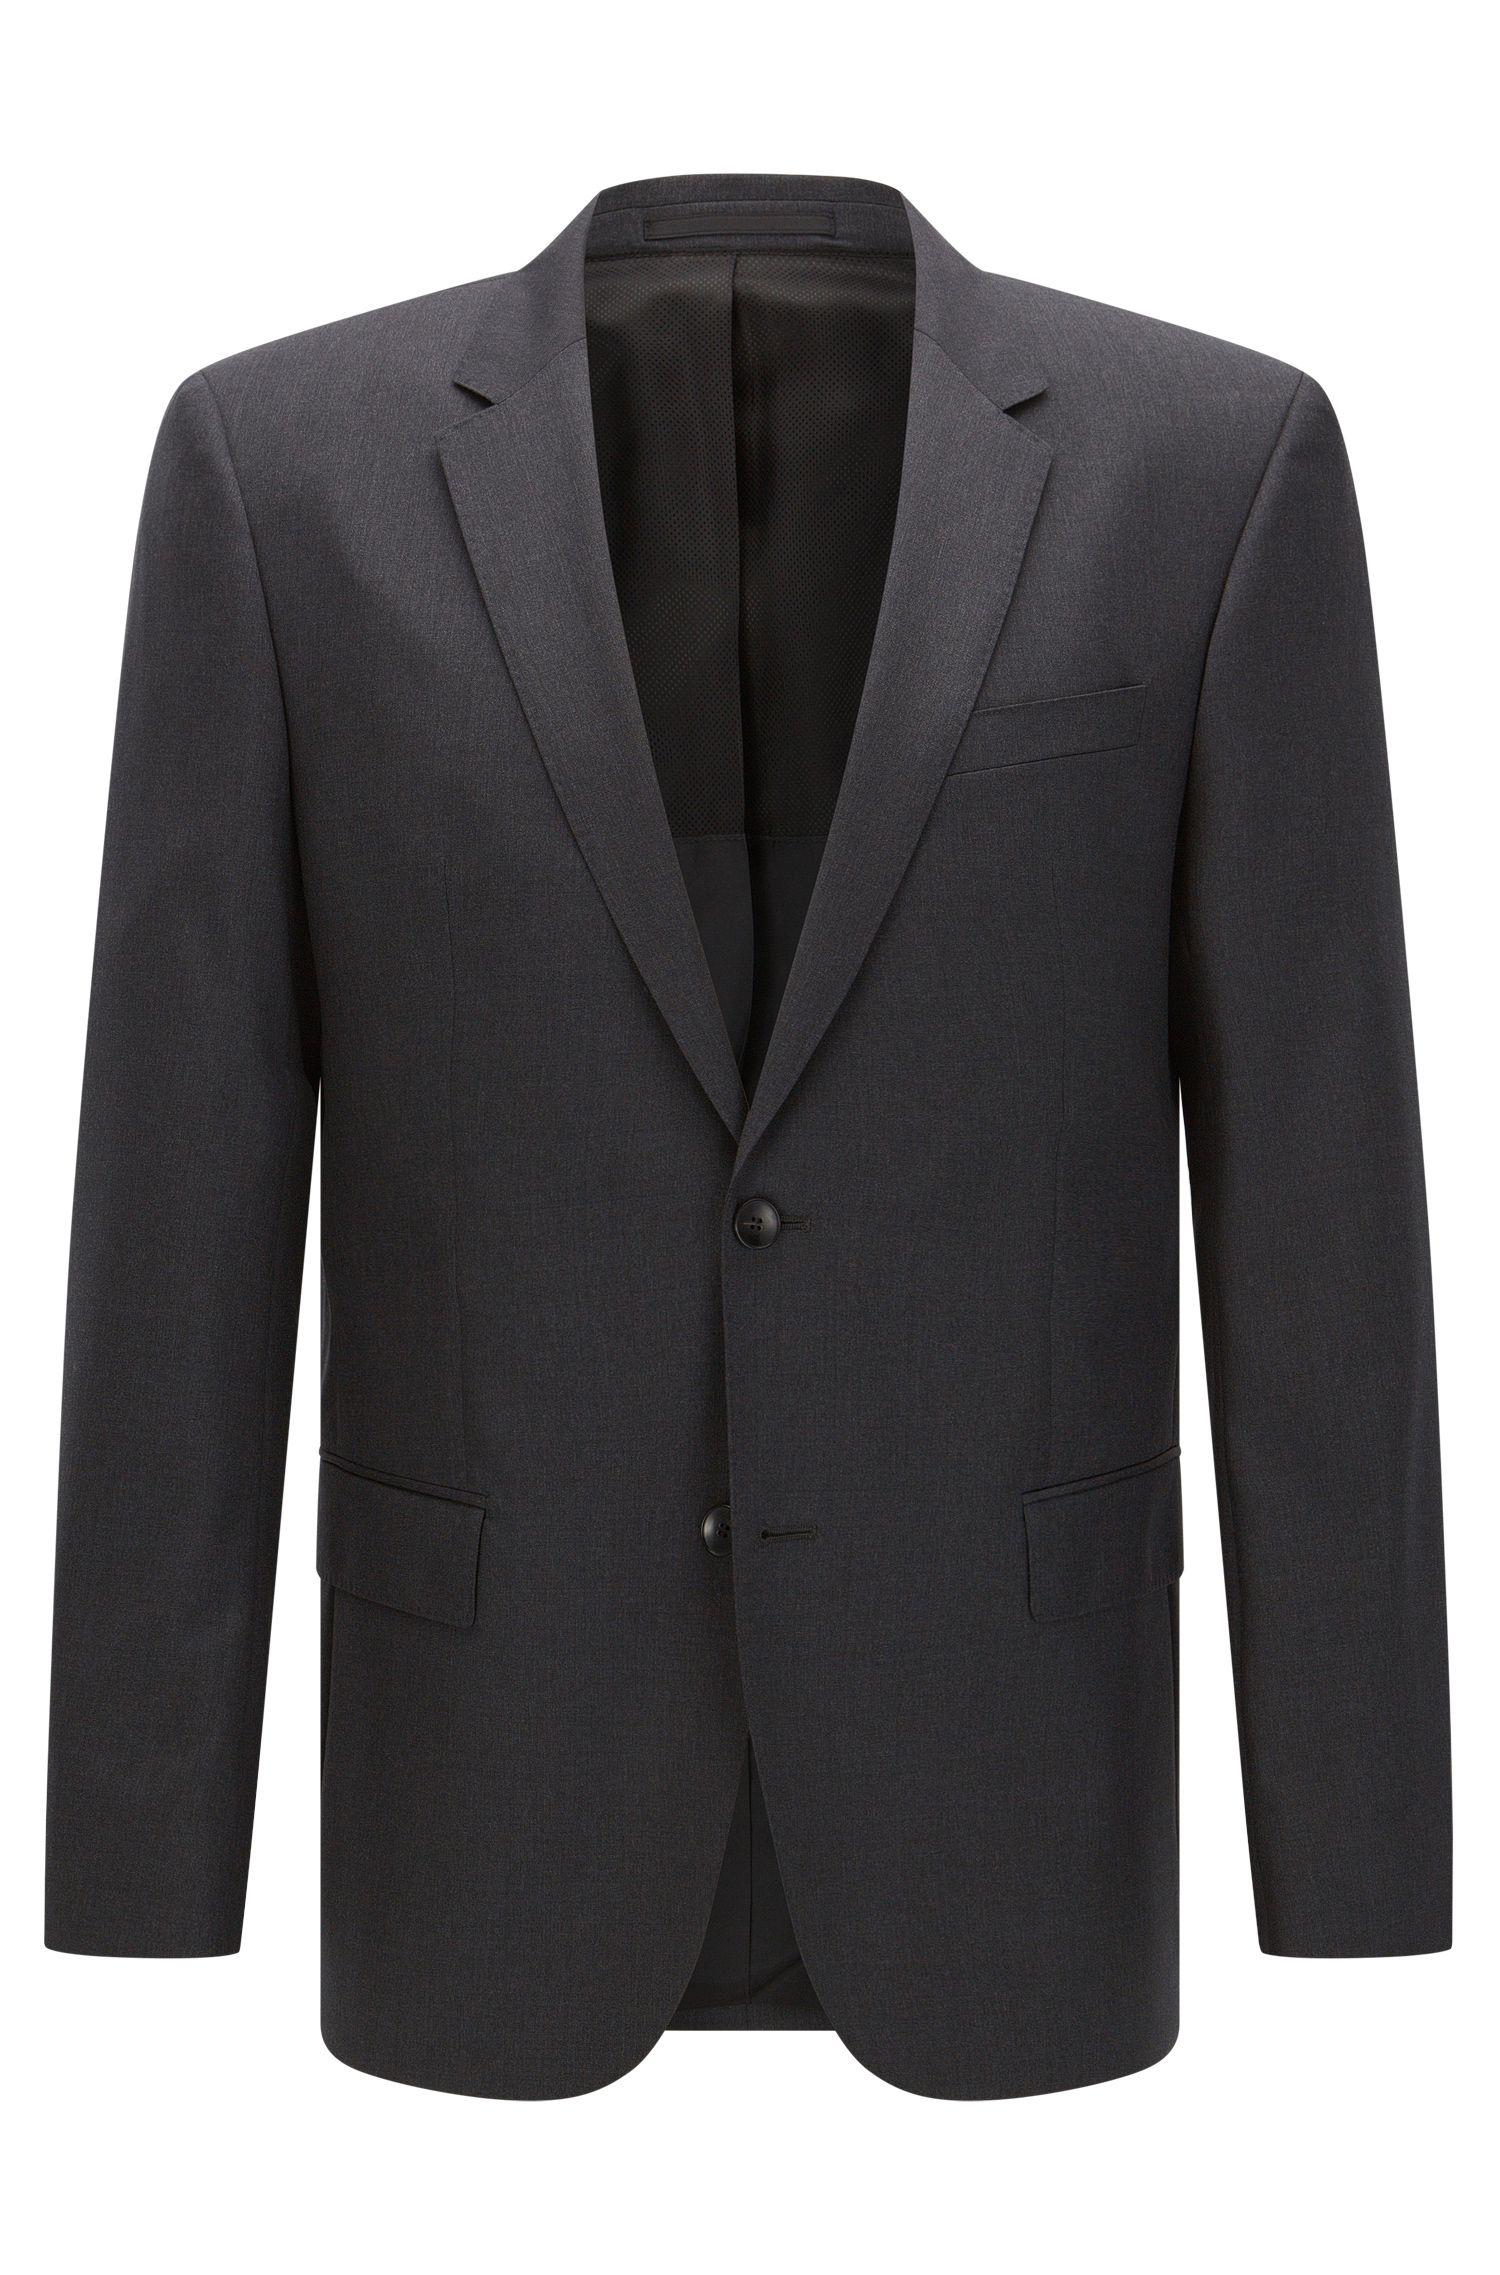 'Hayes Cyl' | Slim Fit, Super 120 Italian Virgin Wool Sport Coat